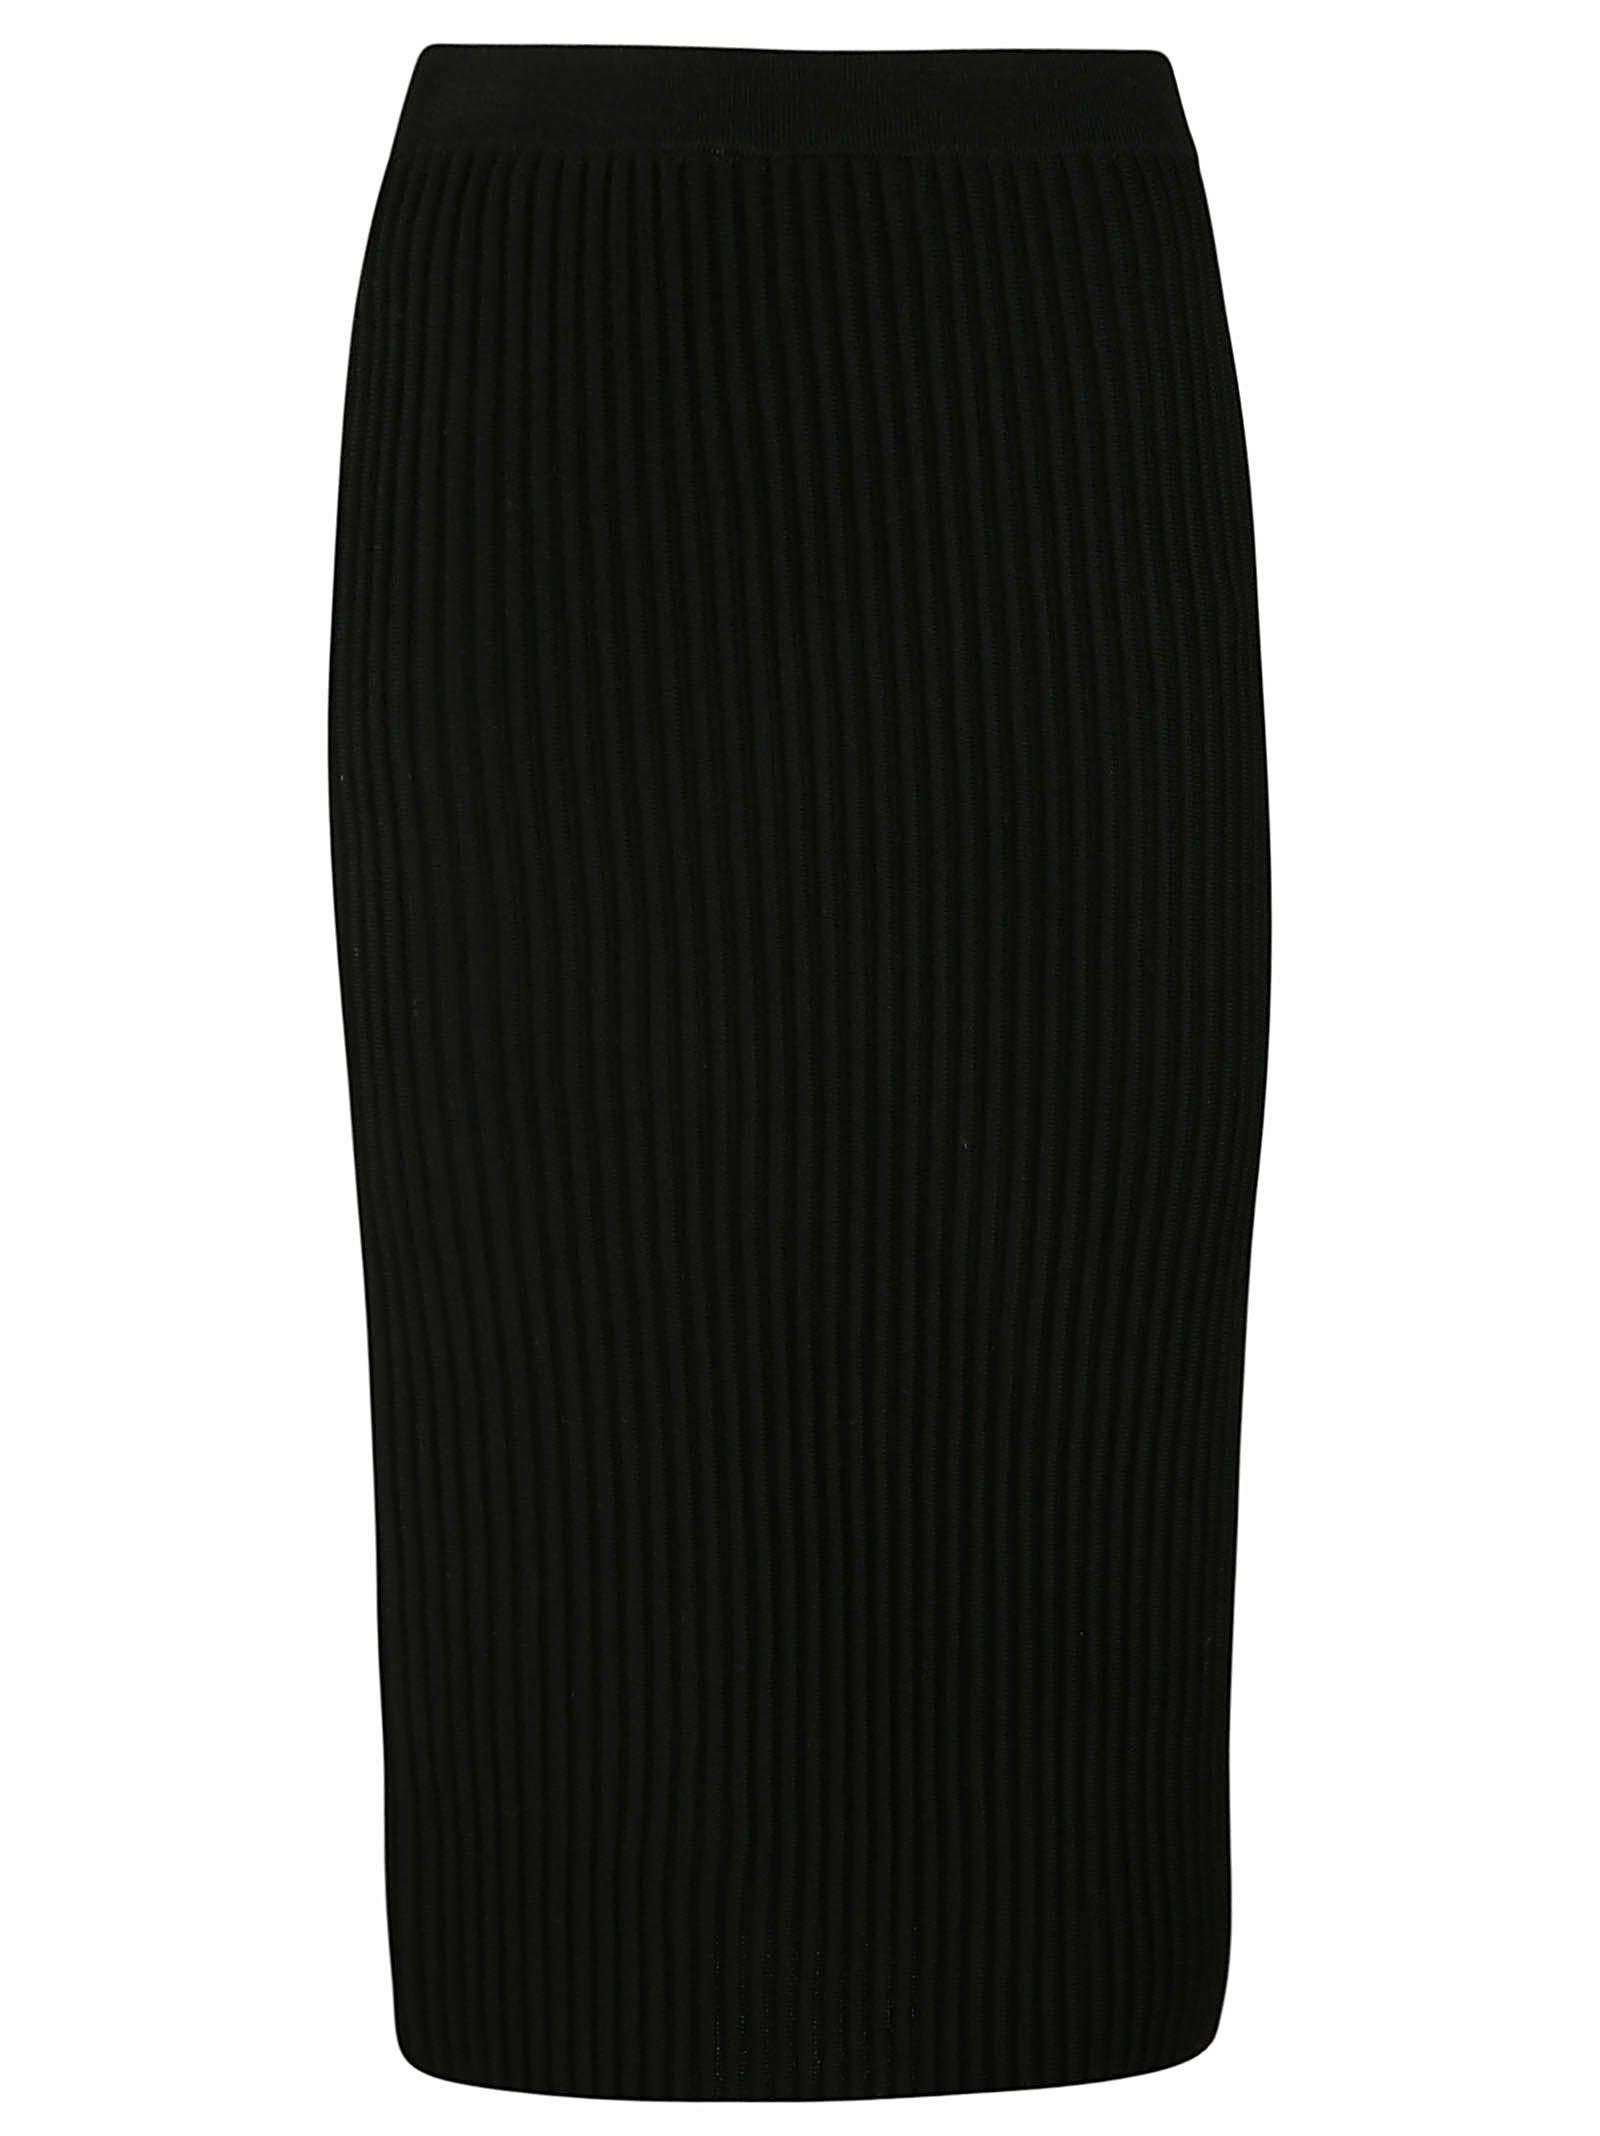 Victoria Beckham Ribbed Skirt